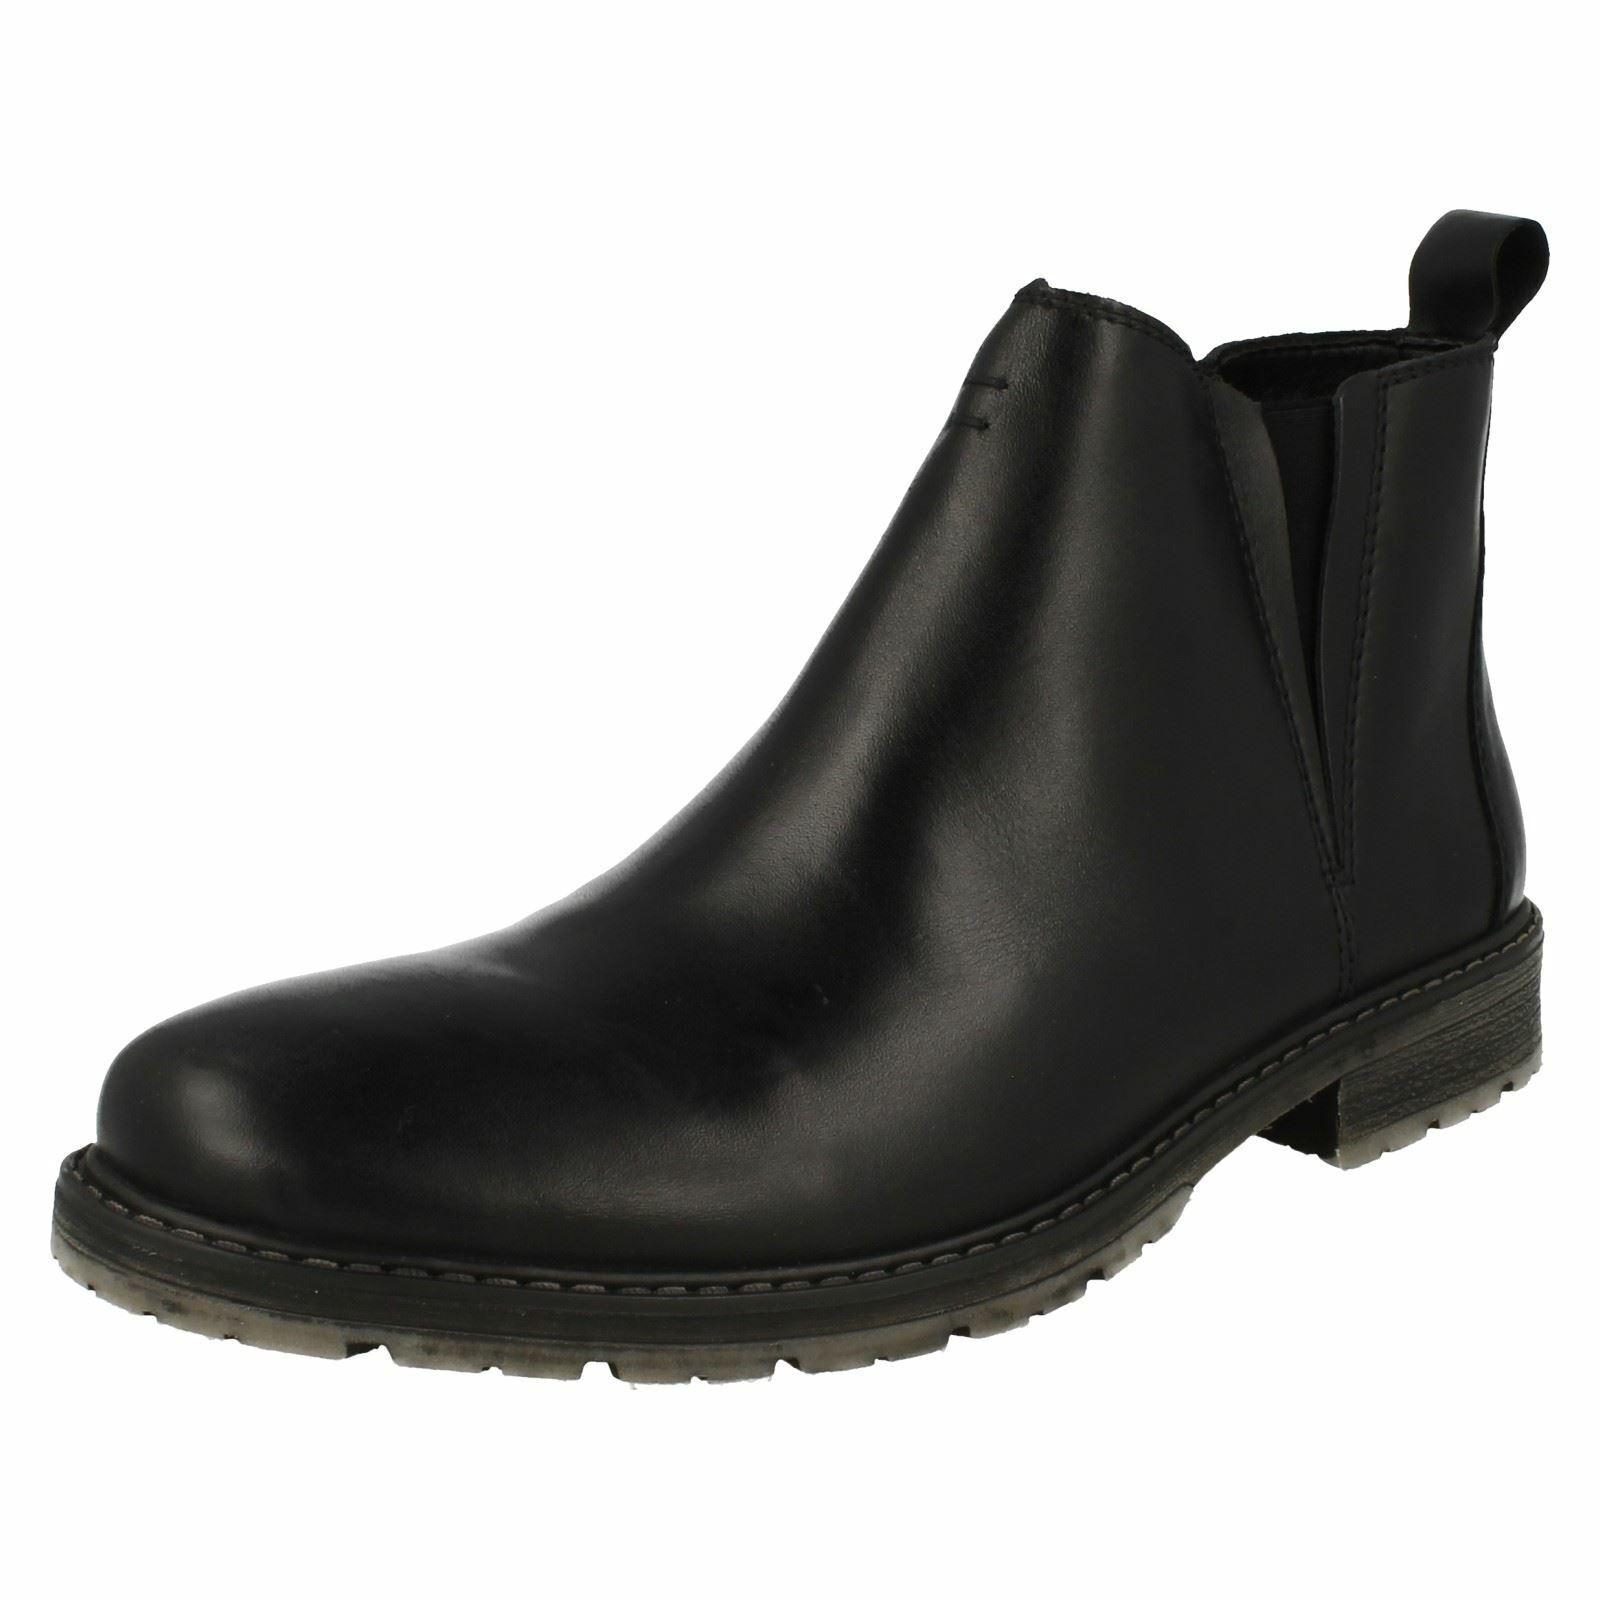 Mens Rieker Smart Zip Up Ankle Boots '38150'